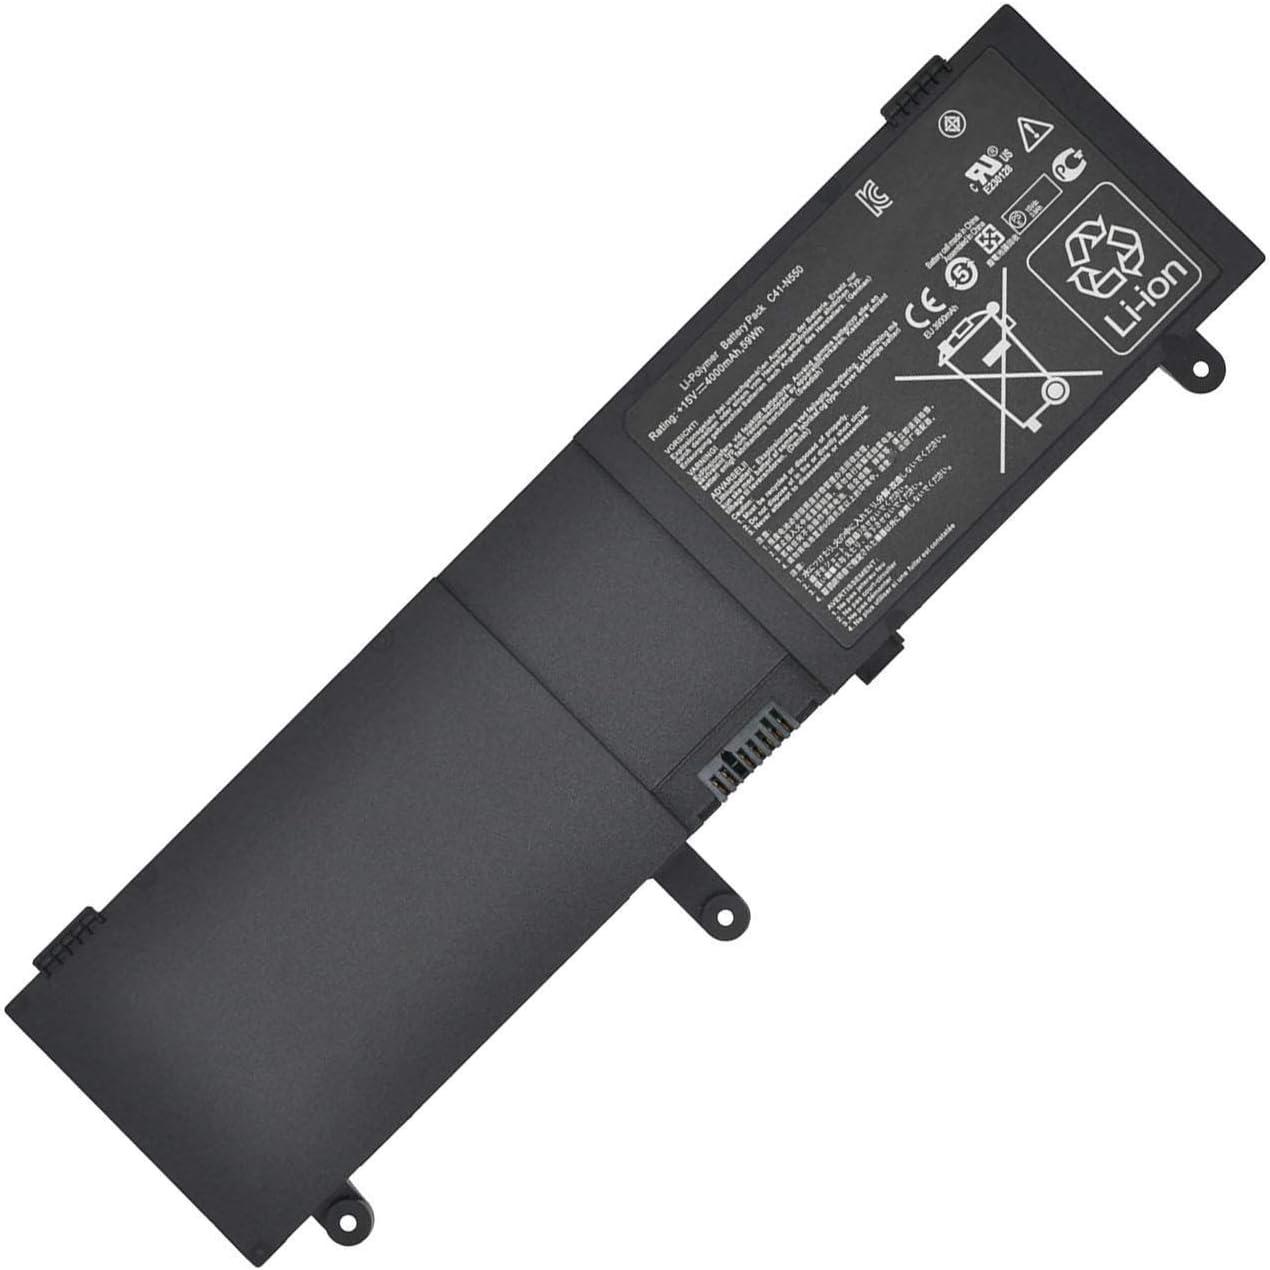 C41-N550 Laptop Battery for Asus N550 N550JA N550JV N550X47JV N550X47JV-SL N550JK Q550L Q550LF etc. Series Laptop Notebook(15V 59Wh)